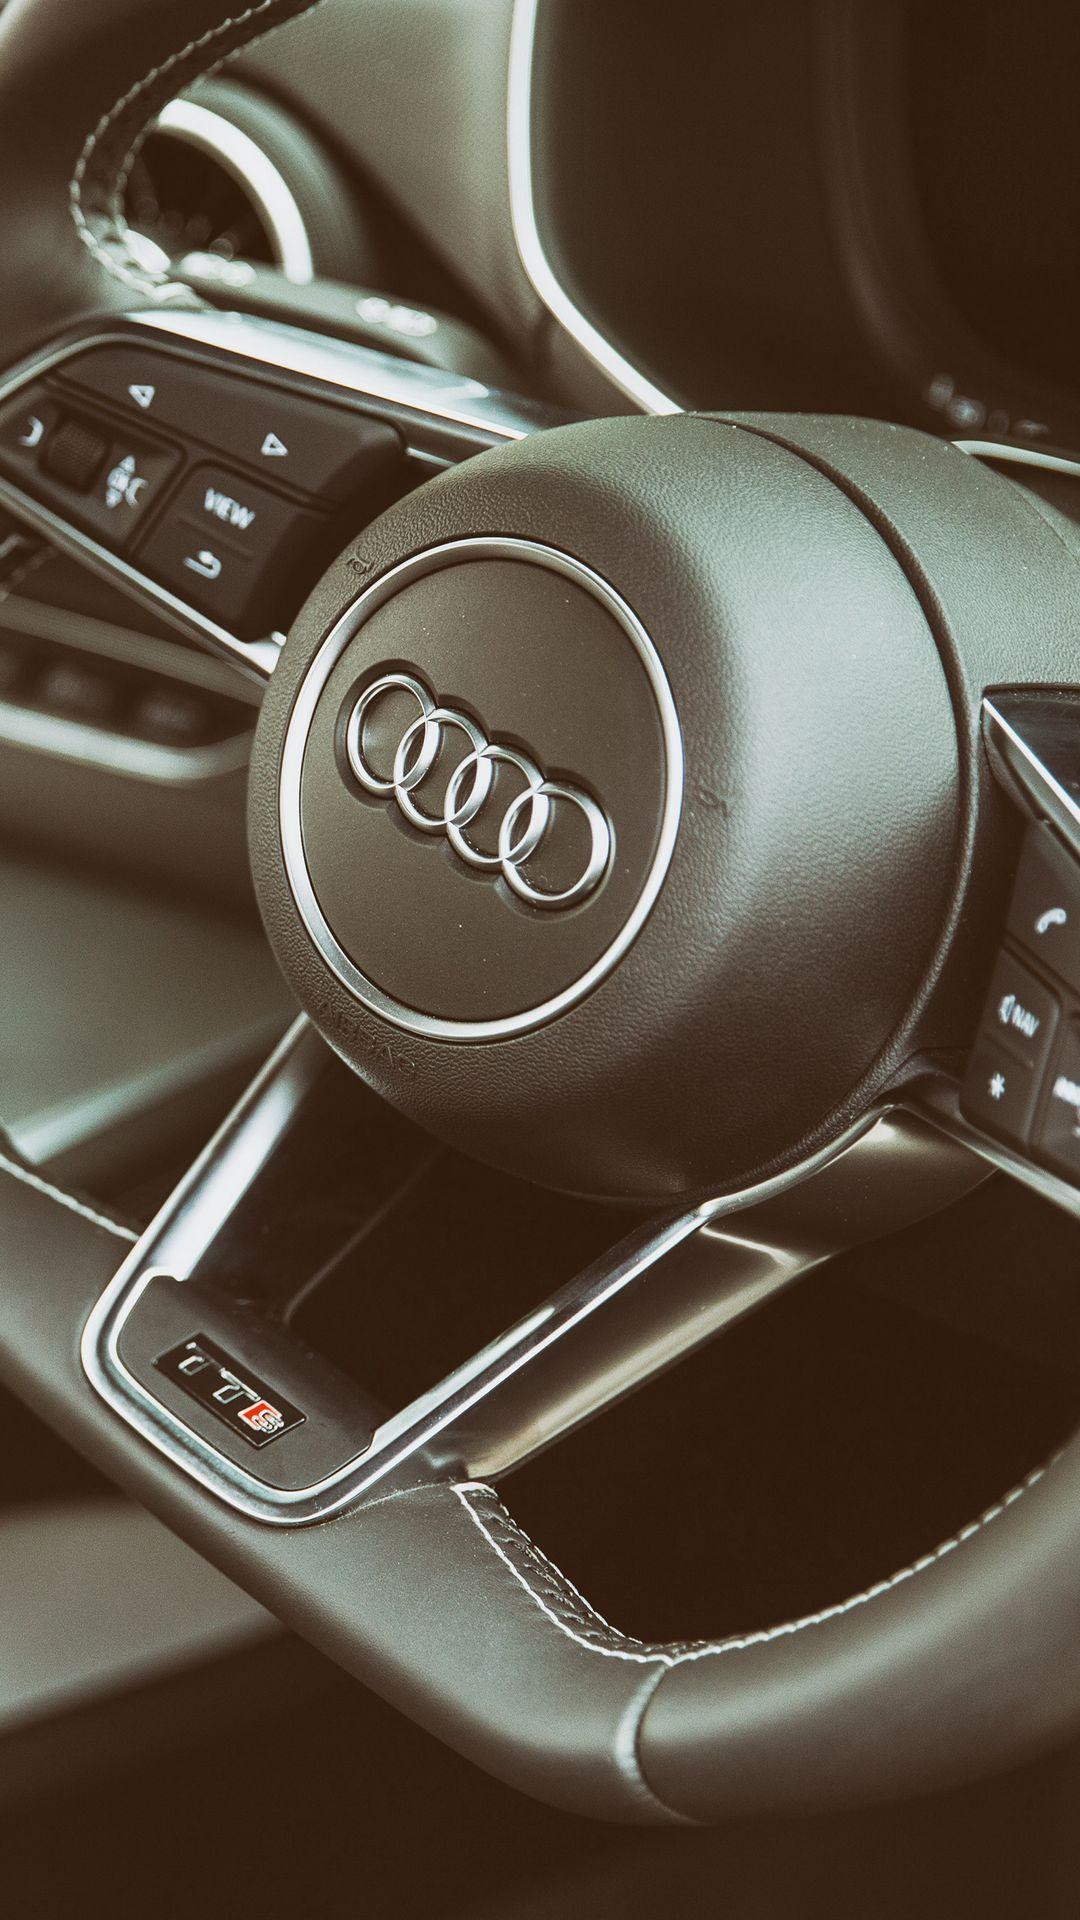 Audi TTS Full HD Wallpapers Free Download